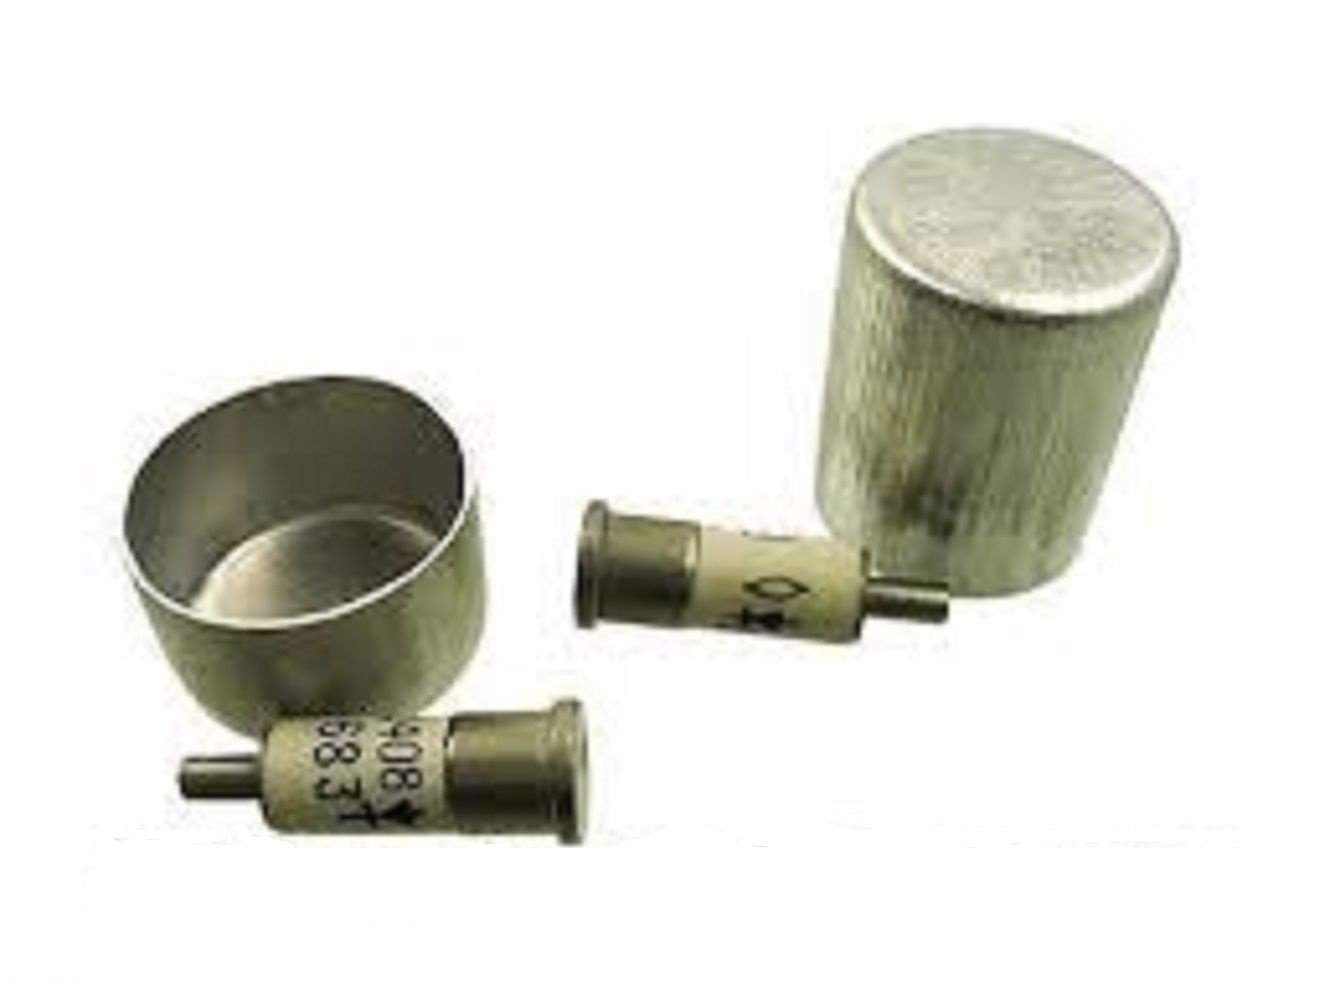 Diode silicon D409A USSR 2 pcs